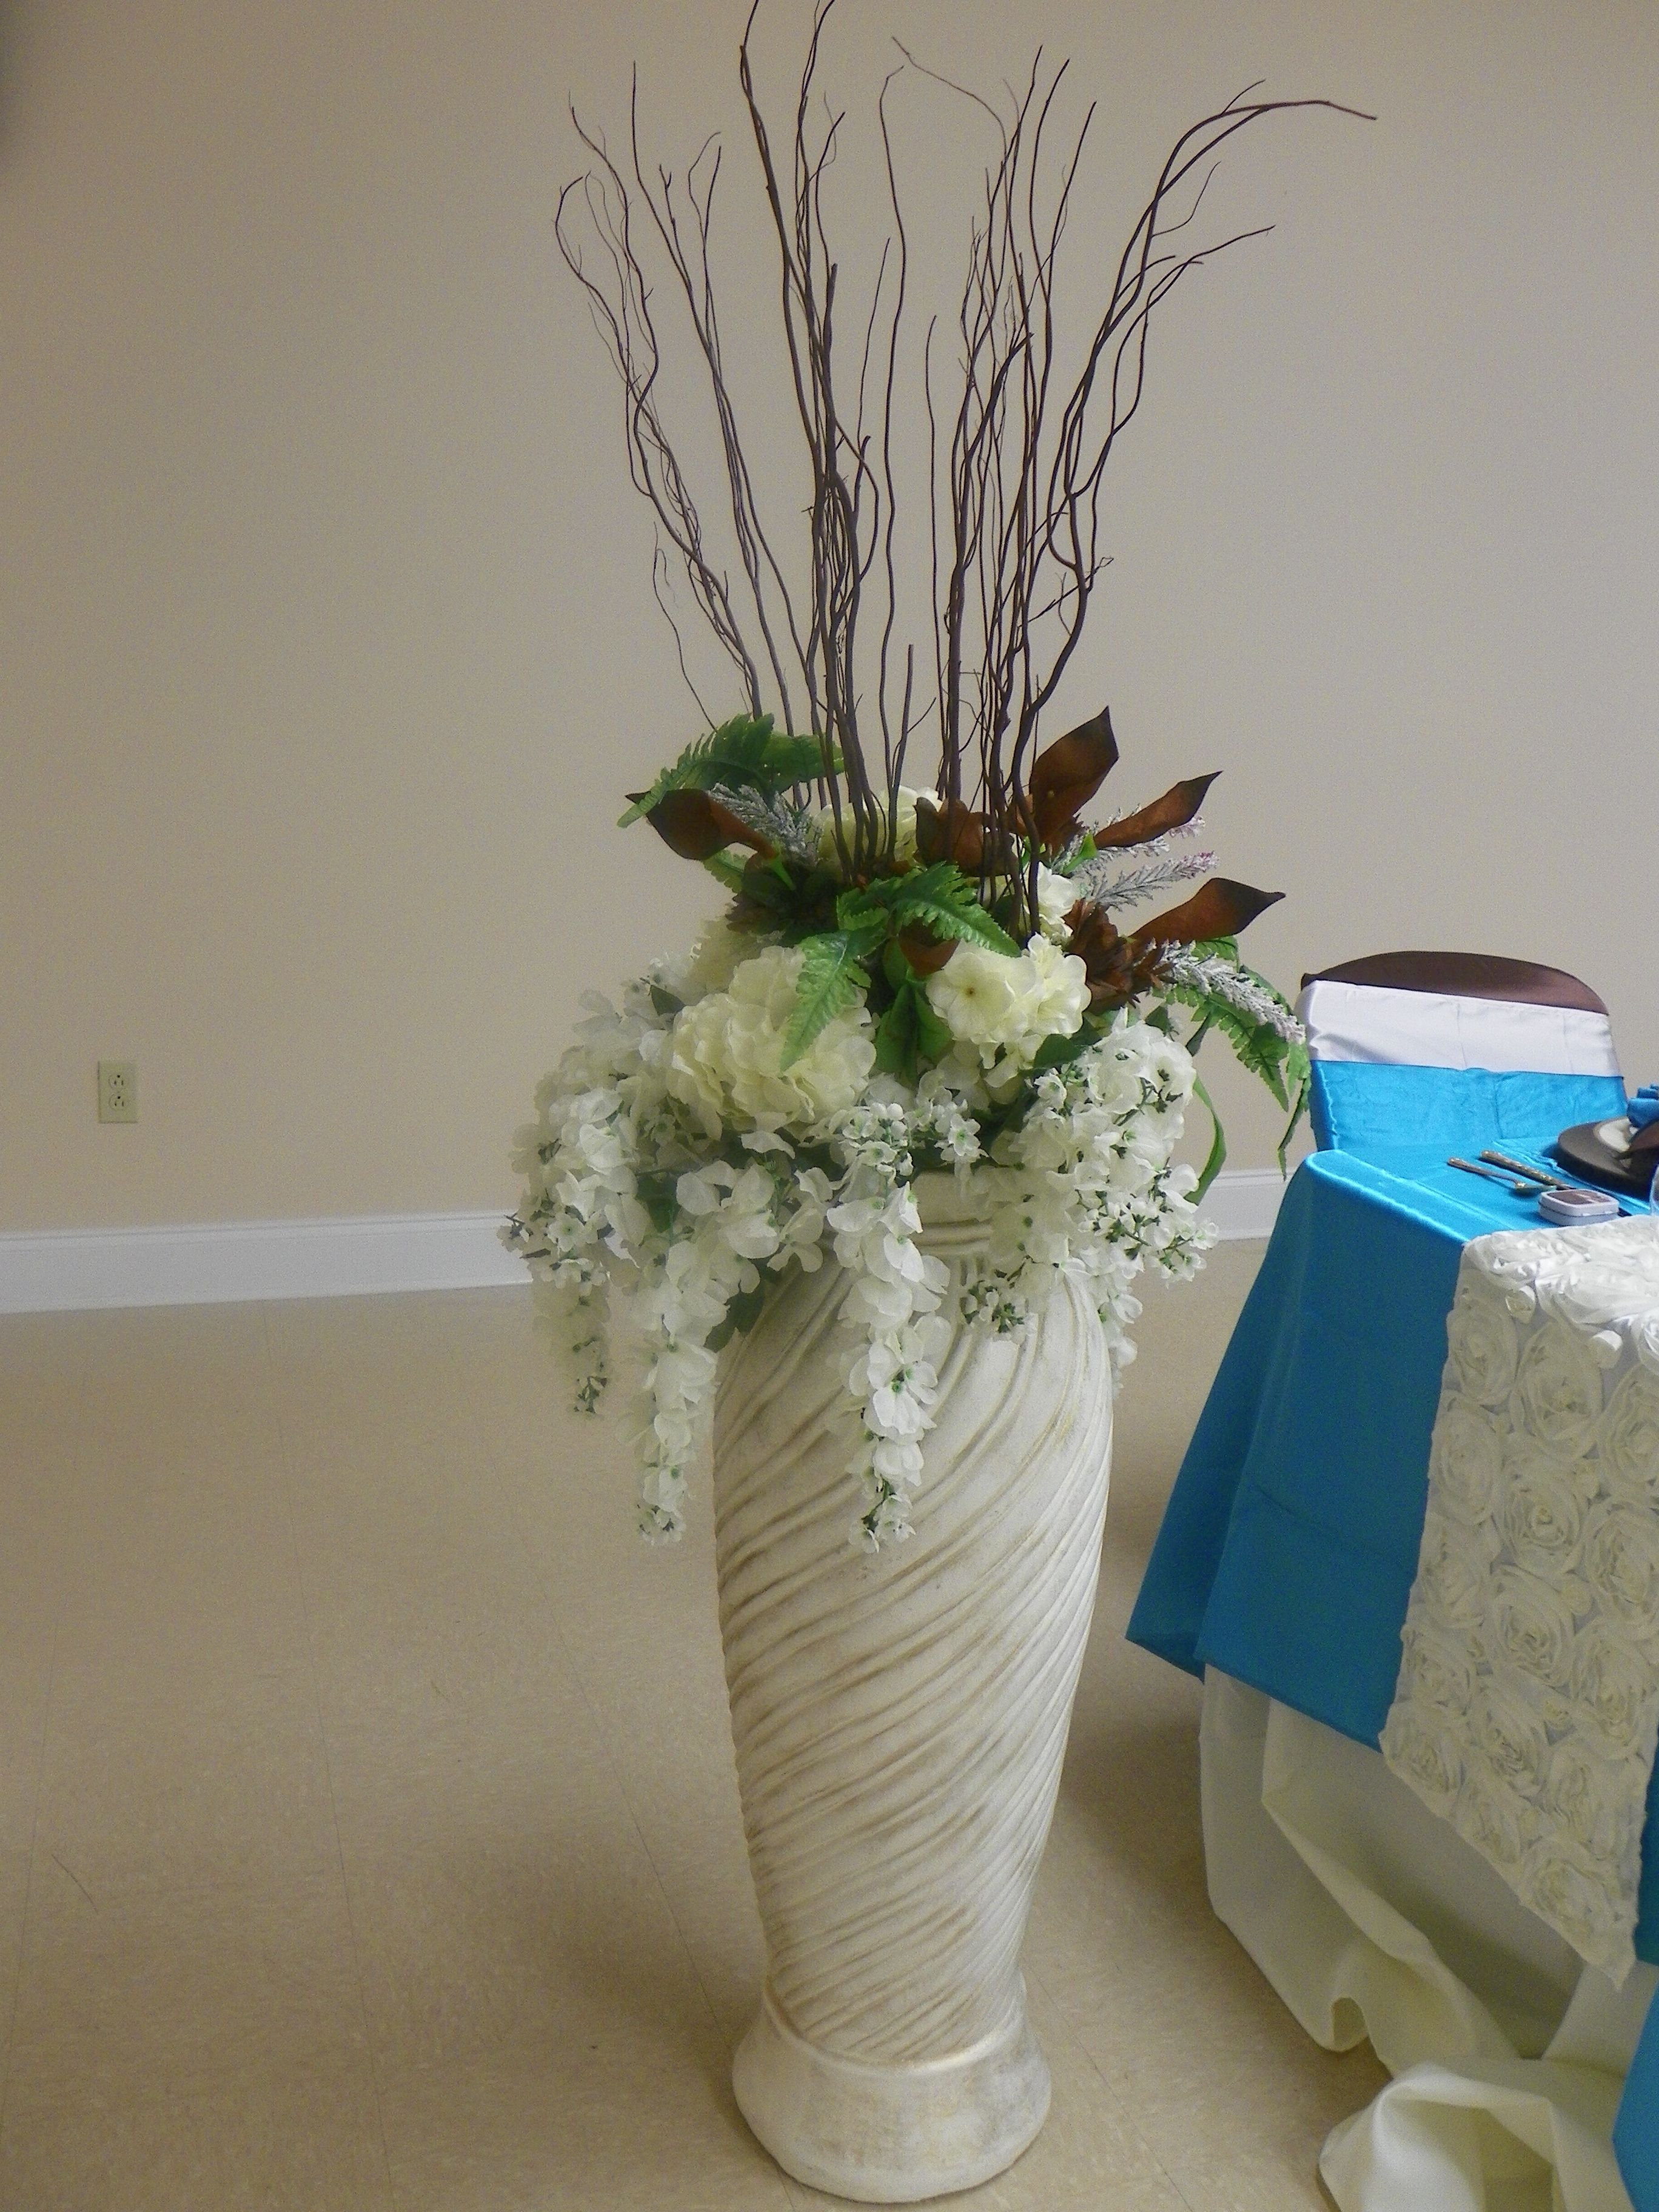 Decor to highlight head table...tall floor vase with ivory hydrangea on fruit vase, colored pencil vase, hyacinth vase, warrior vase, hydro vase, orange poppy vase, hibiscus vase, gardenia vase, lily vase, peony vase, rubin's vase, geometric vase, the blue vase, iron wall vase, lilies of the valley vase, succulent vase, bonsai vase, wedding bouquet vase, curly willow vase, wisteria vase,